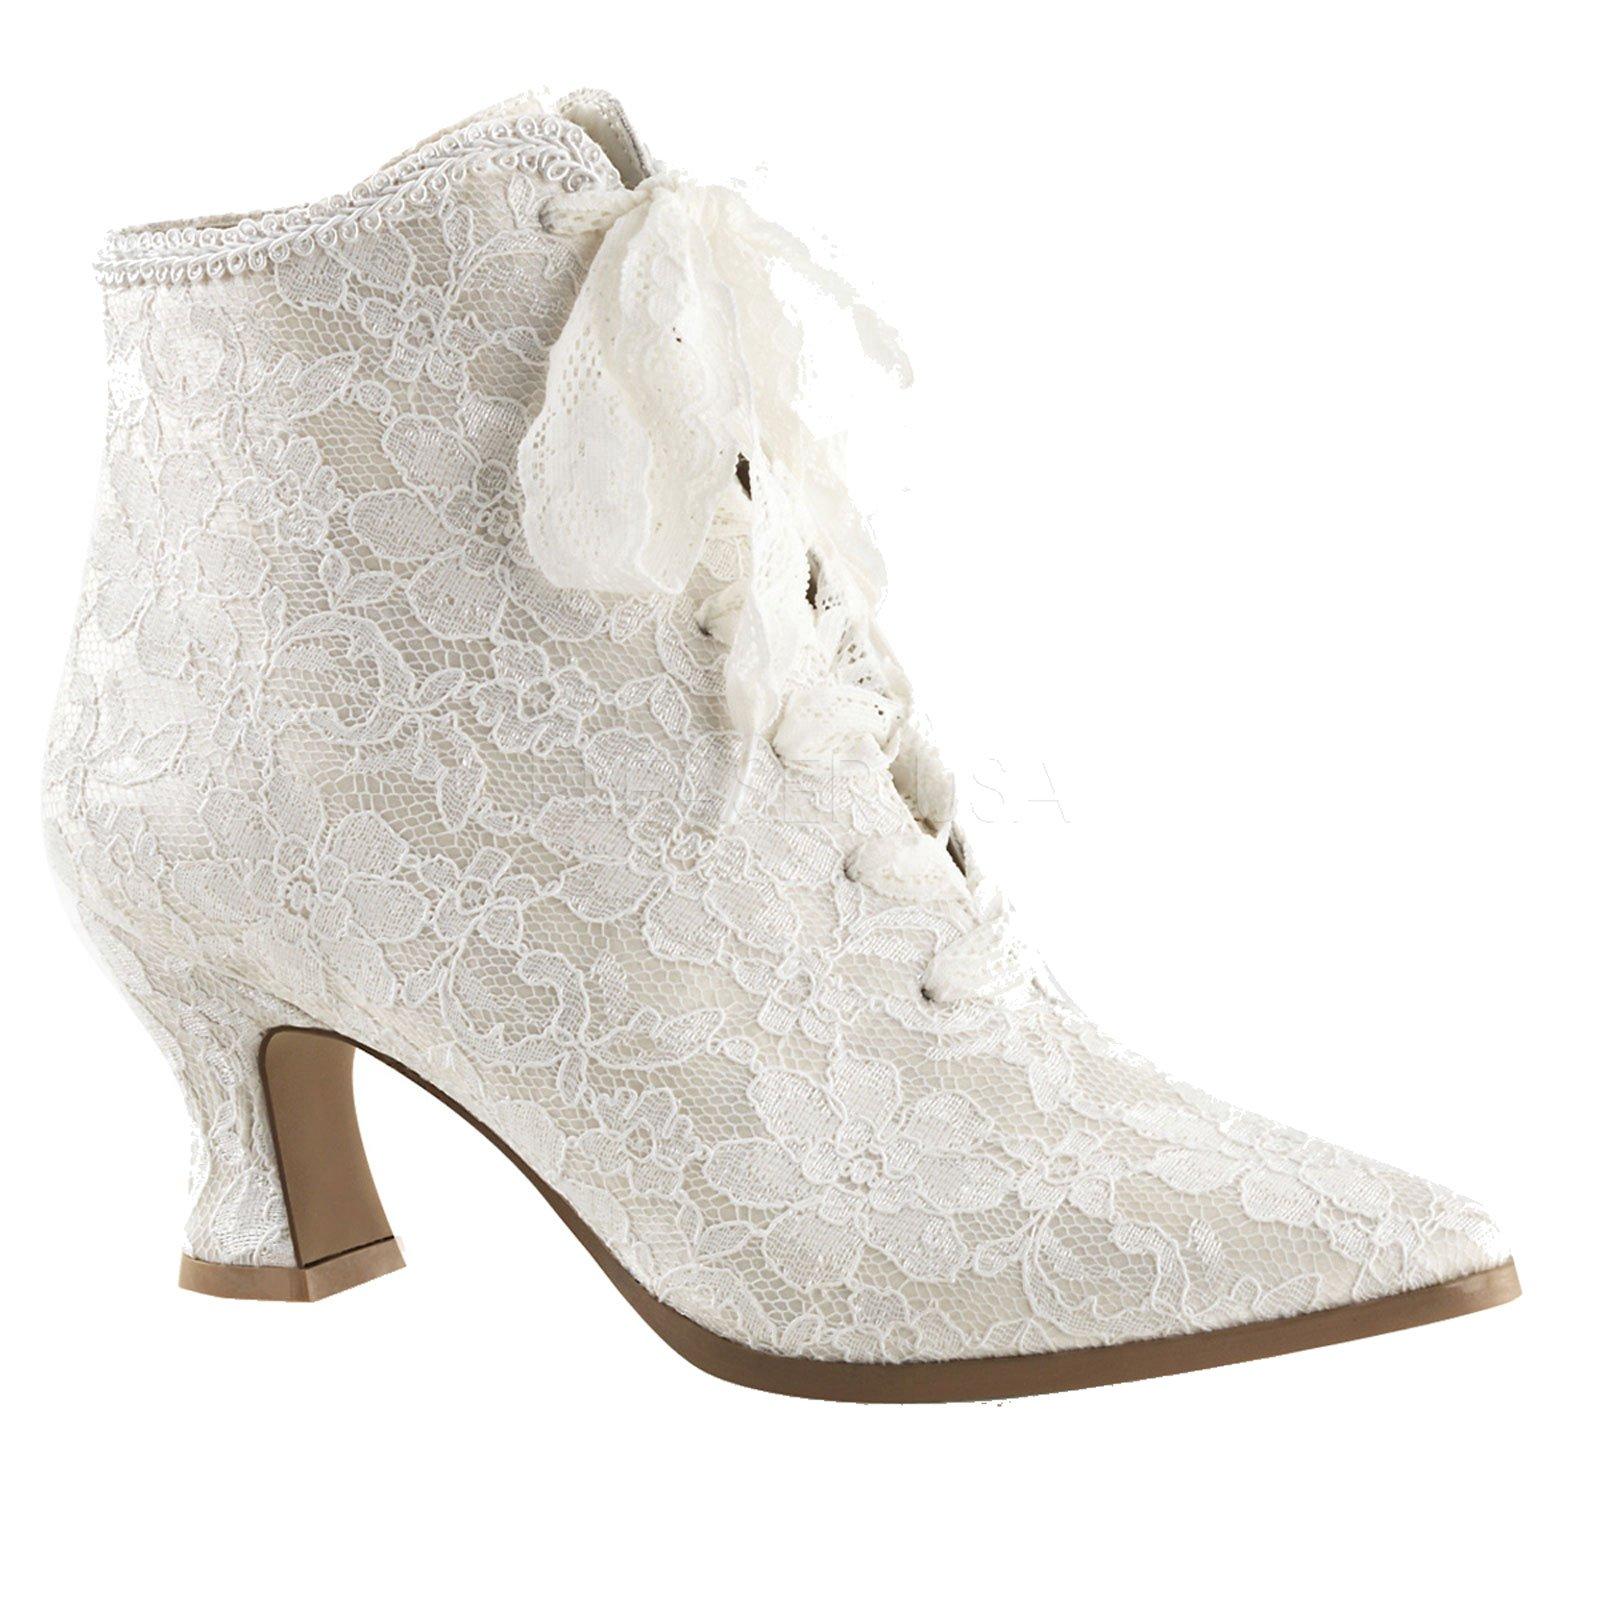 Endless Road 30 (7, Ivory) Ivory Wedding Boots